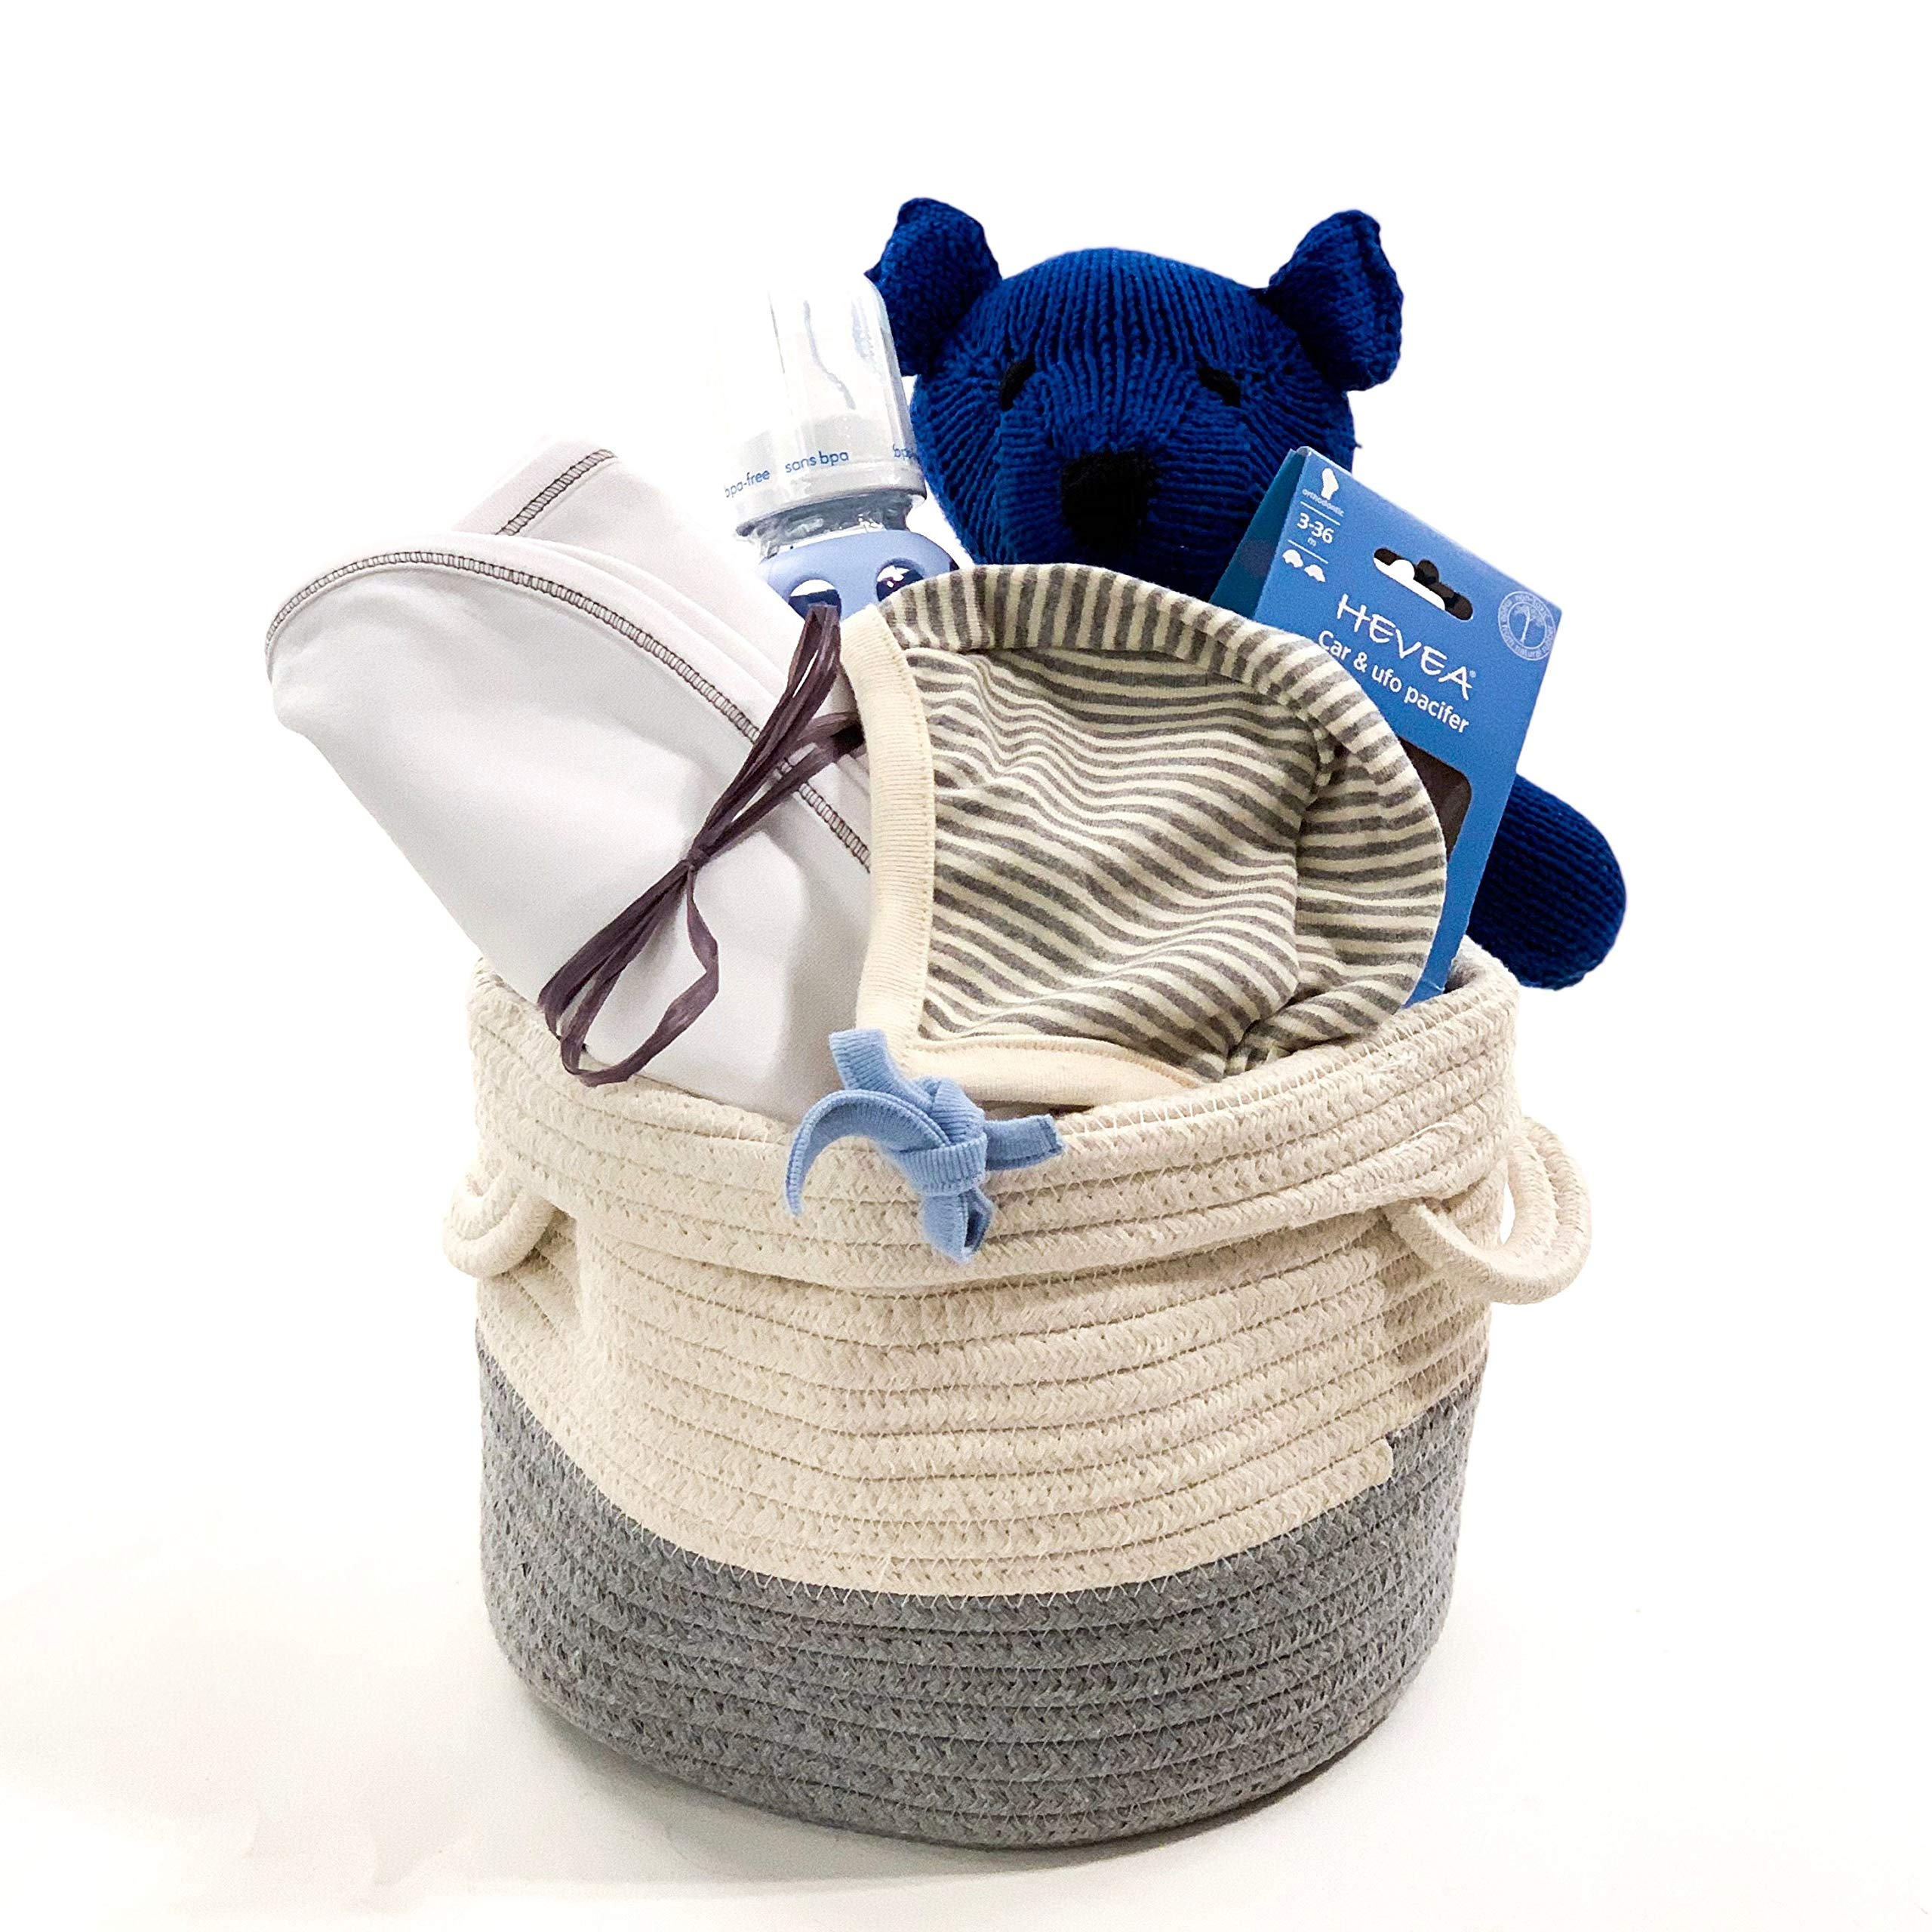 Organic Baby Girl Gift Basket - Blue & Gray Baby Shower